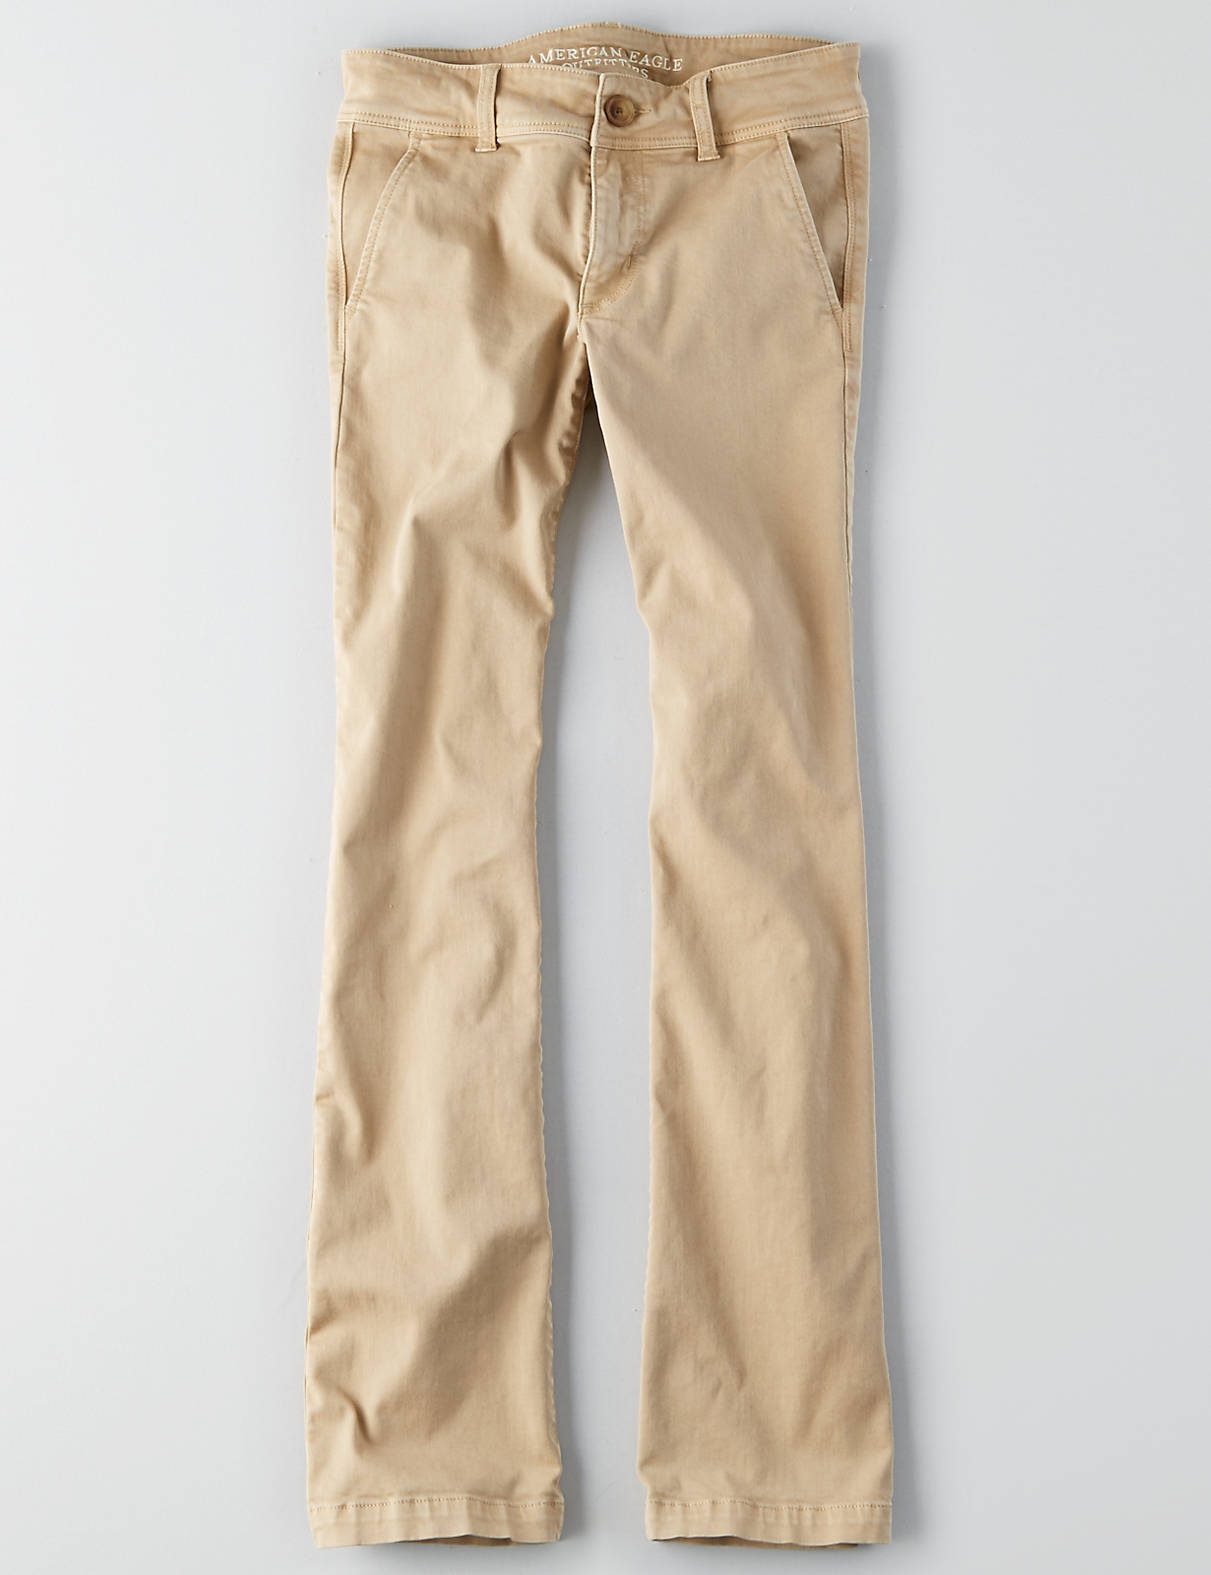 khaki pants for women display product reviews for aeo denim x kick boot pant NOFXOJR